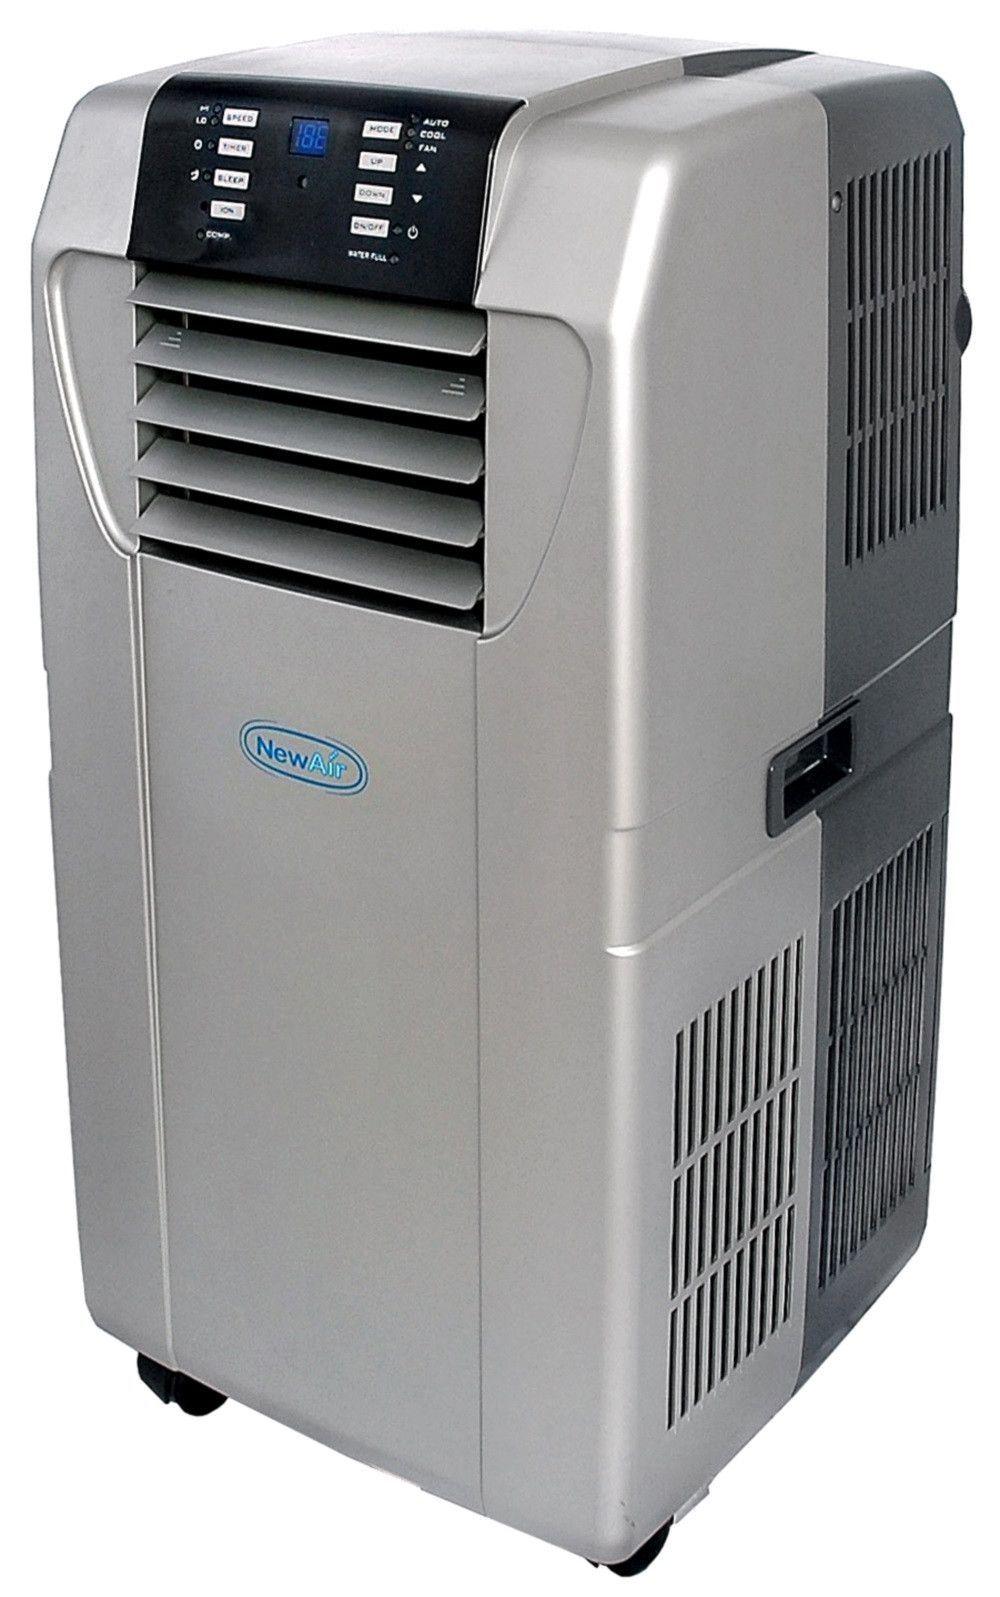 NewAir AC12000H Portable Air Conditioner & Heater Room